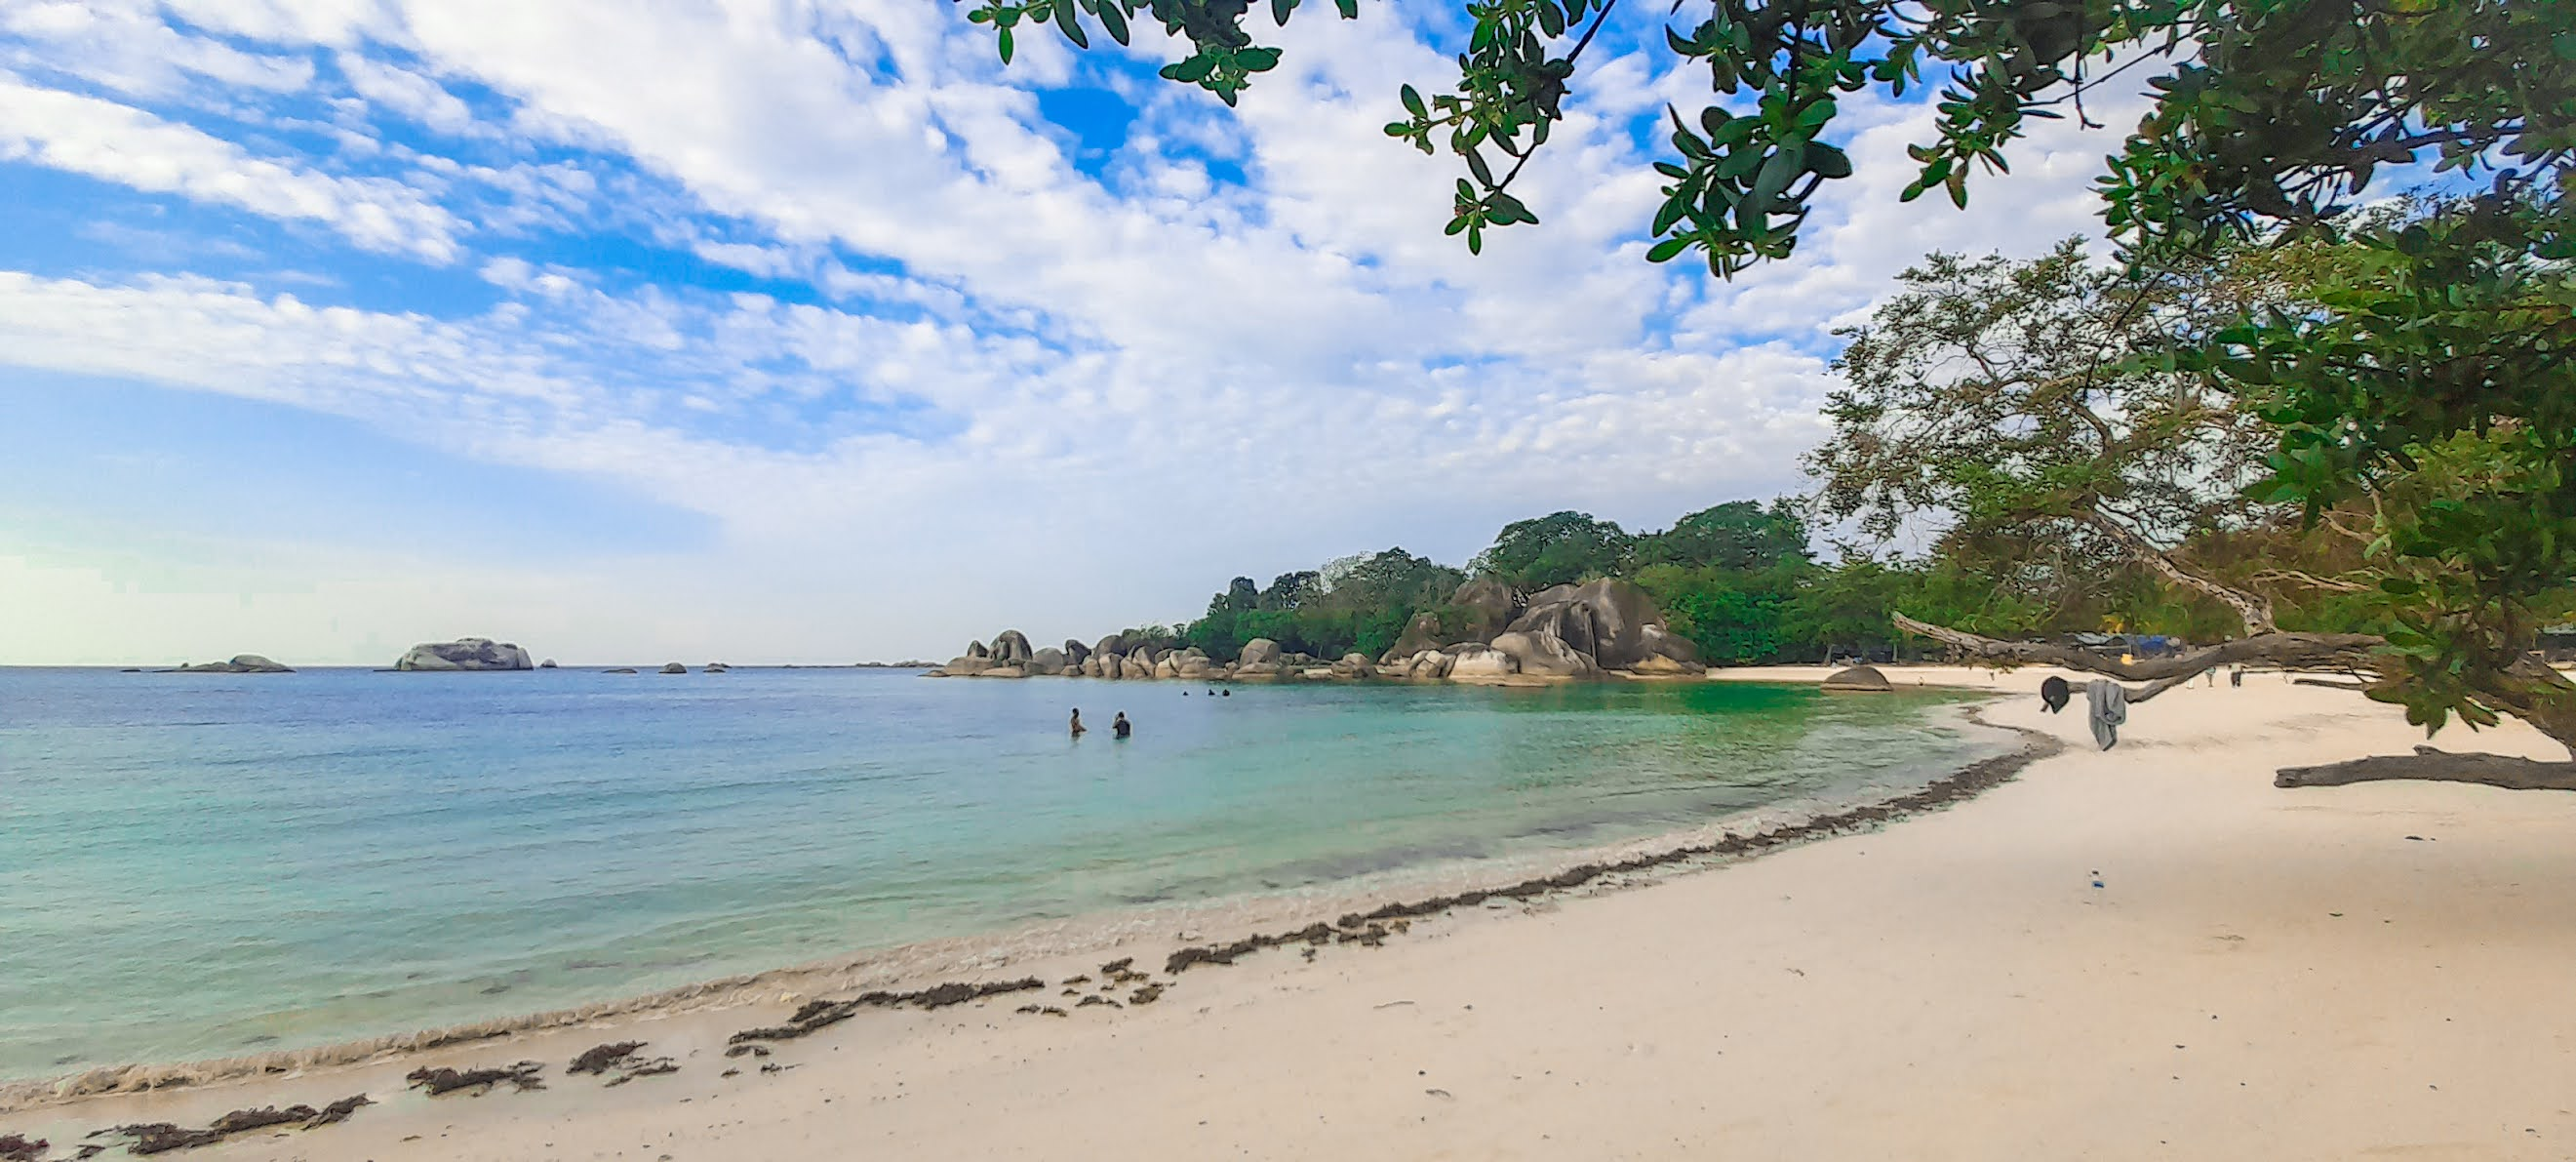 Pesona Geopark Batu Raksasa di Pulau Belitung yang diakui UNESCO